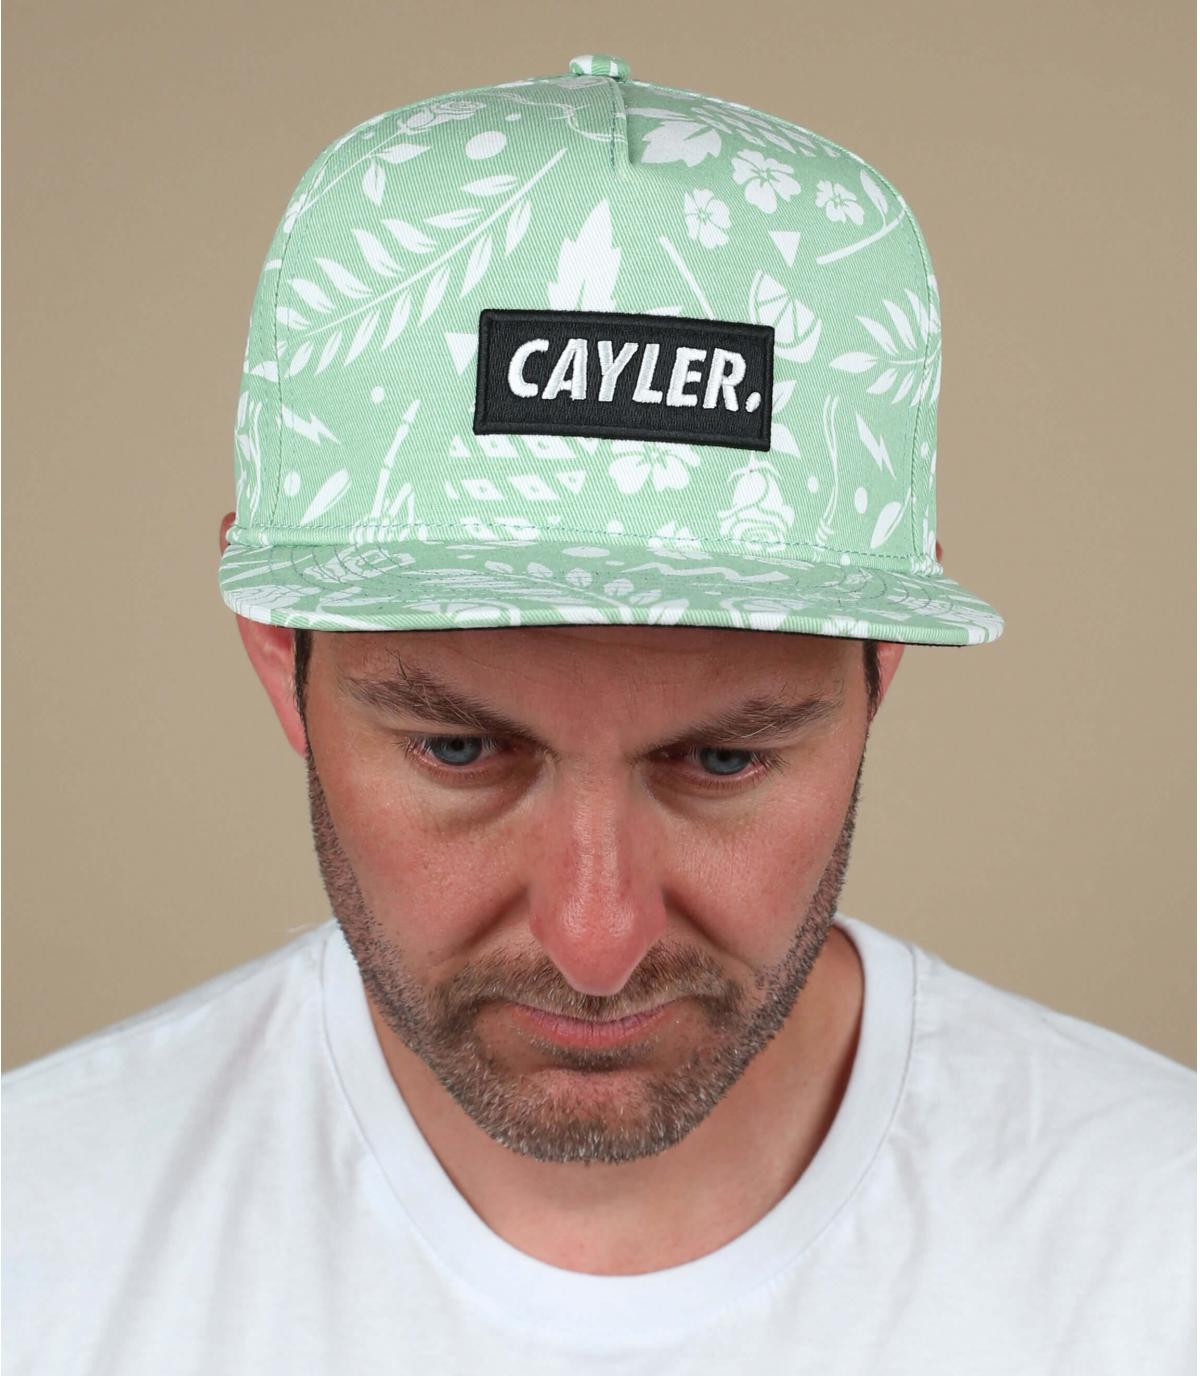 Cappellino con stampa Cayler